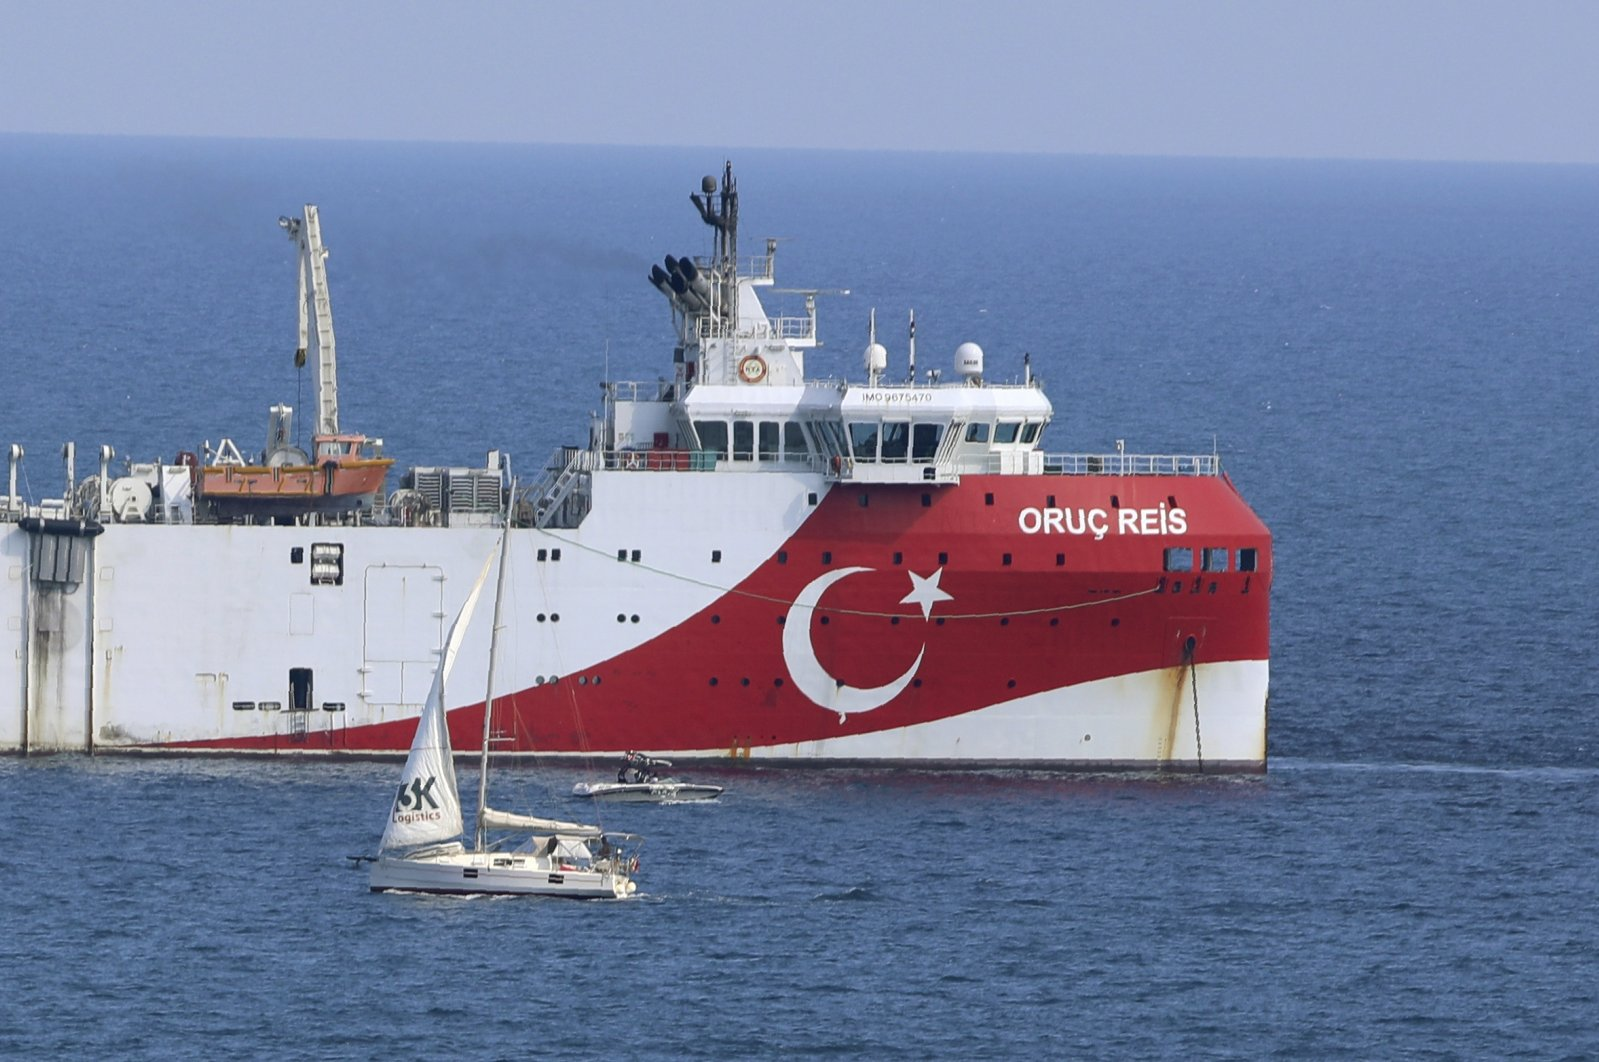 Turkey's seismic vessel Oruç Reis anchors off the coast of the southern province of Antalya on the Mediterranean, Turkey, Sept. 13, 2020. (AP Photo)